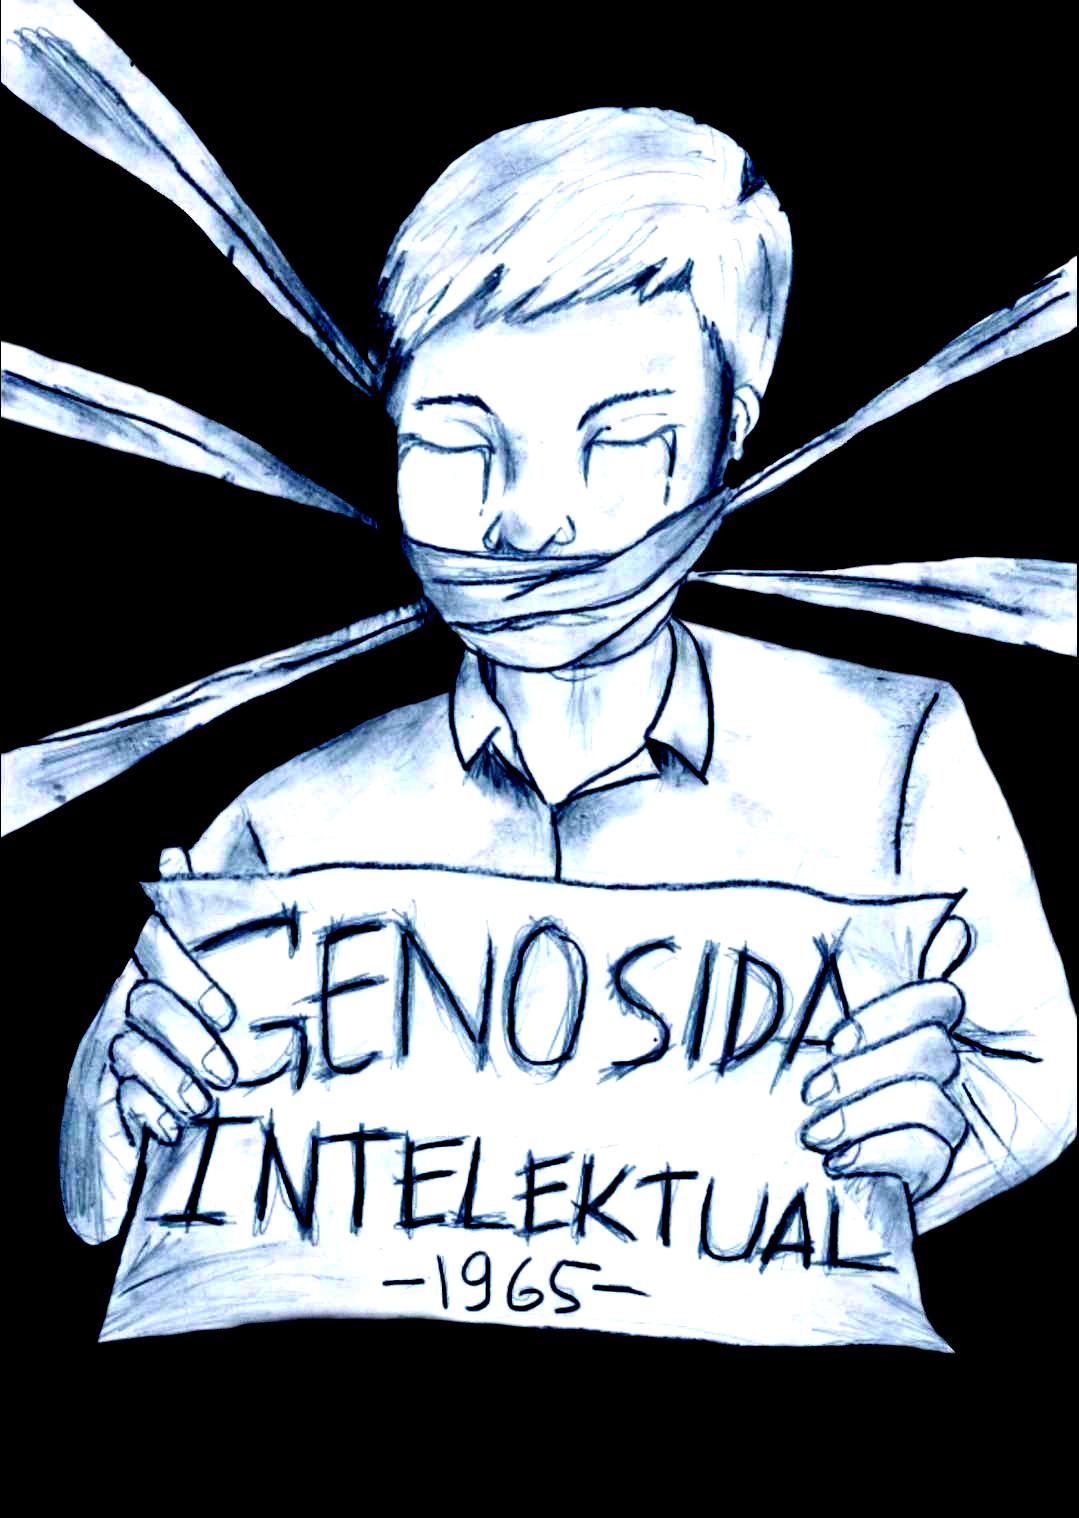 Intelectual Genocide '65